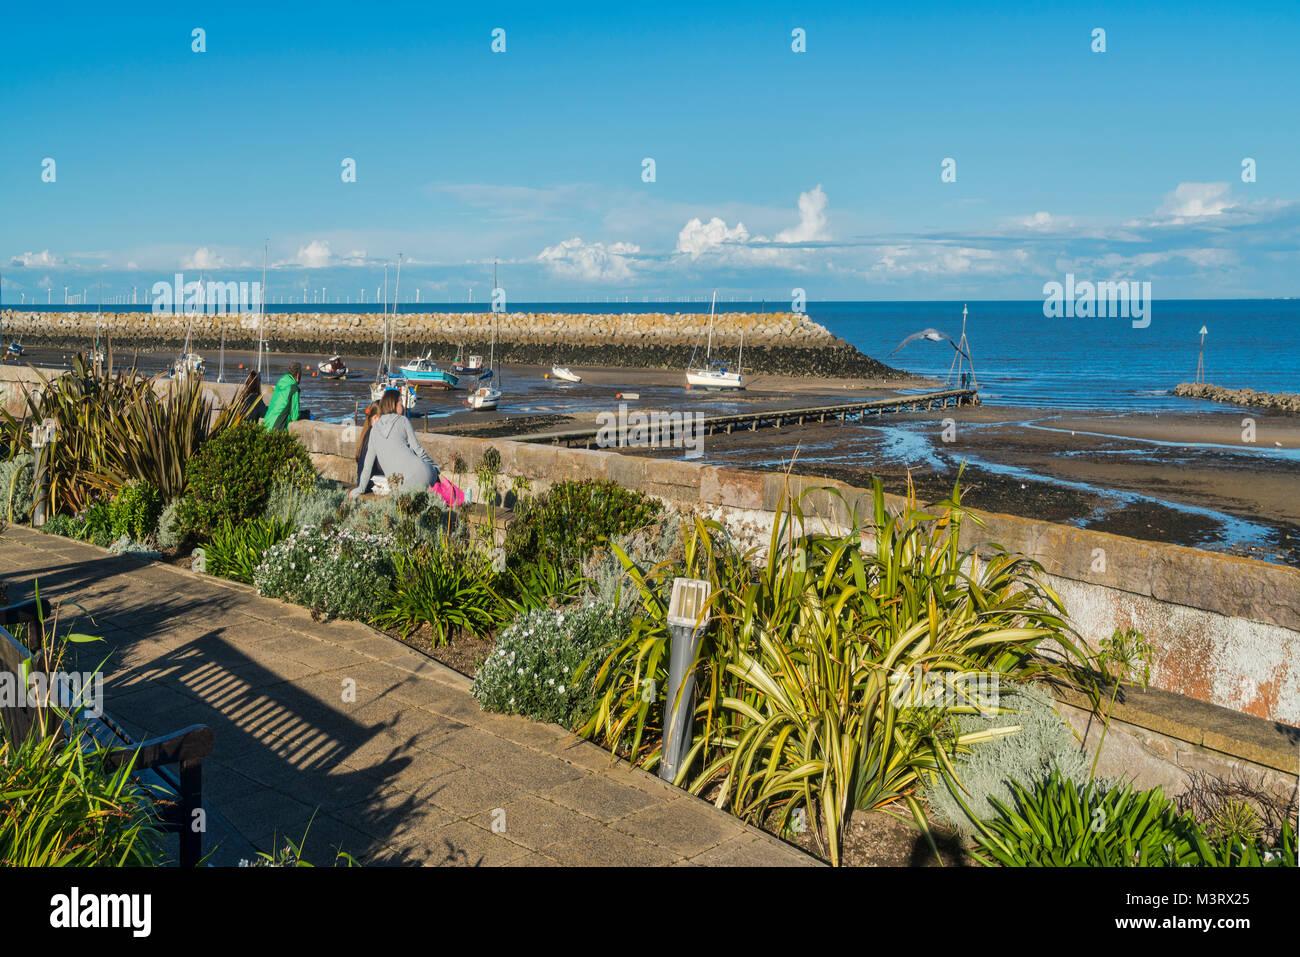 Promenade gardens, Rhos on Sea, Colwyn Bay, seafront, north Wales, UK - Stock Image